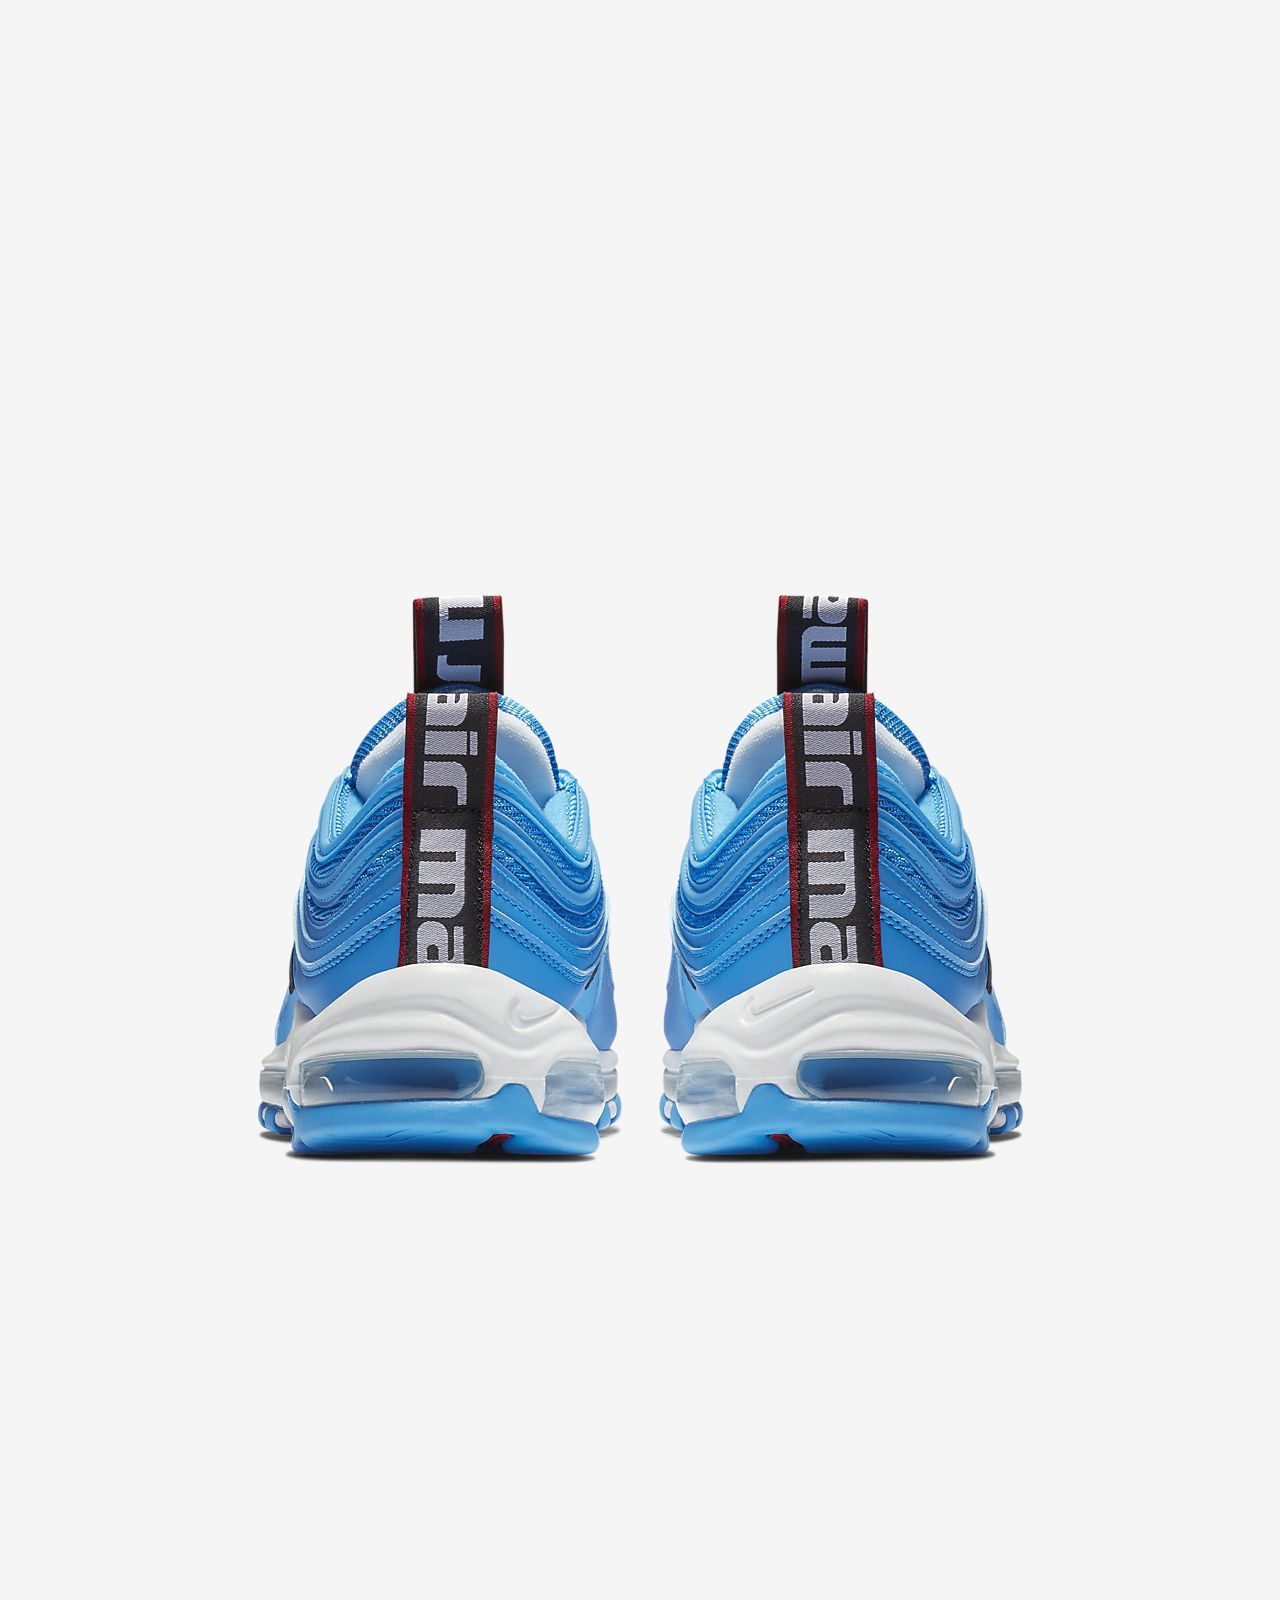 official photos c4899 88906 ... Nike Air Max 97 Premium Men s Shoe